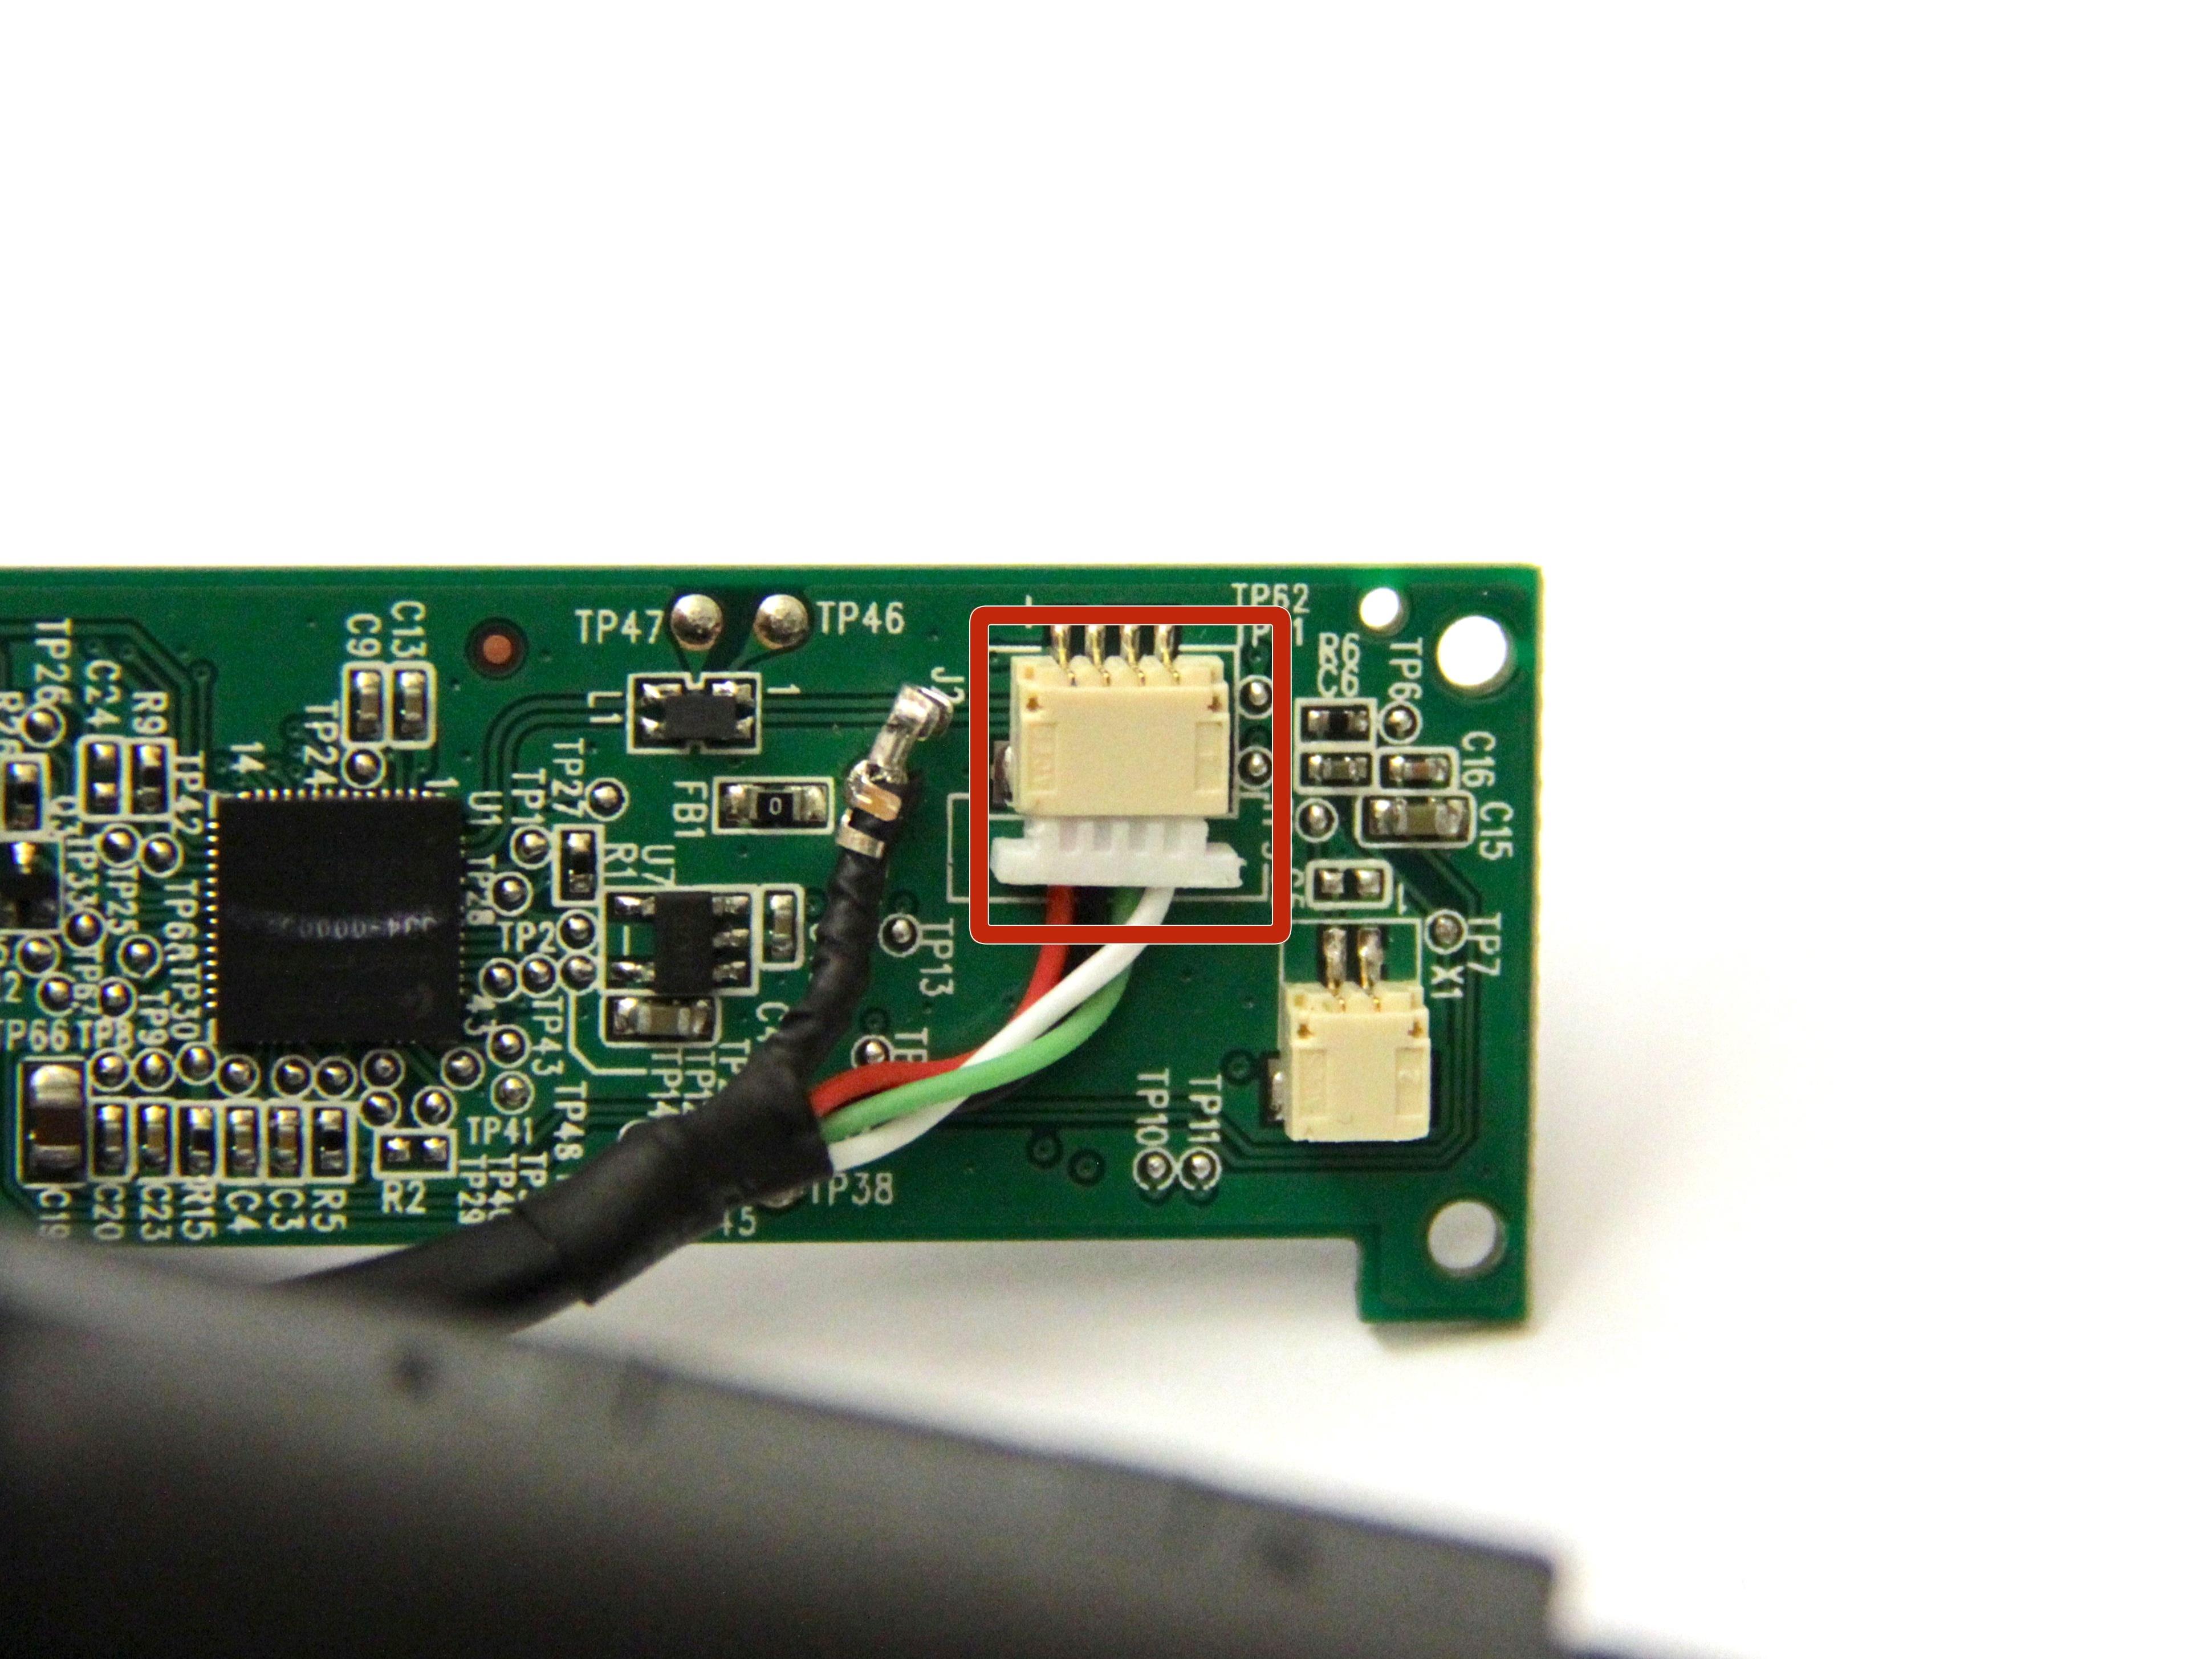 logitech webcam pro 9000 repair ifixit rh ifixit com Cam Switch Wiring Diagram Pinhole Camera with Audio Wiring Diagrams